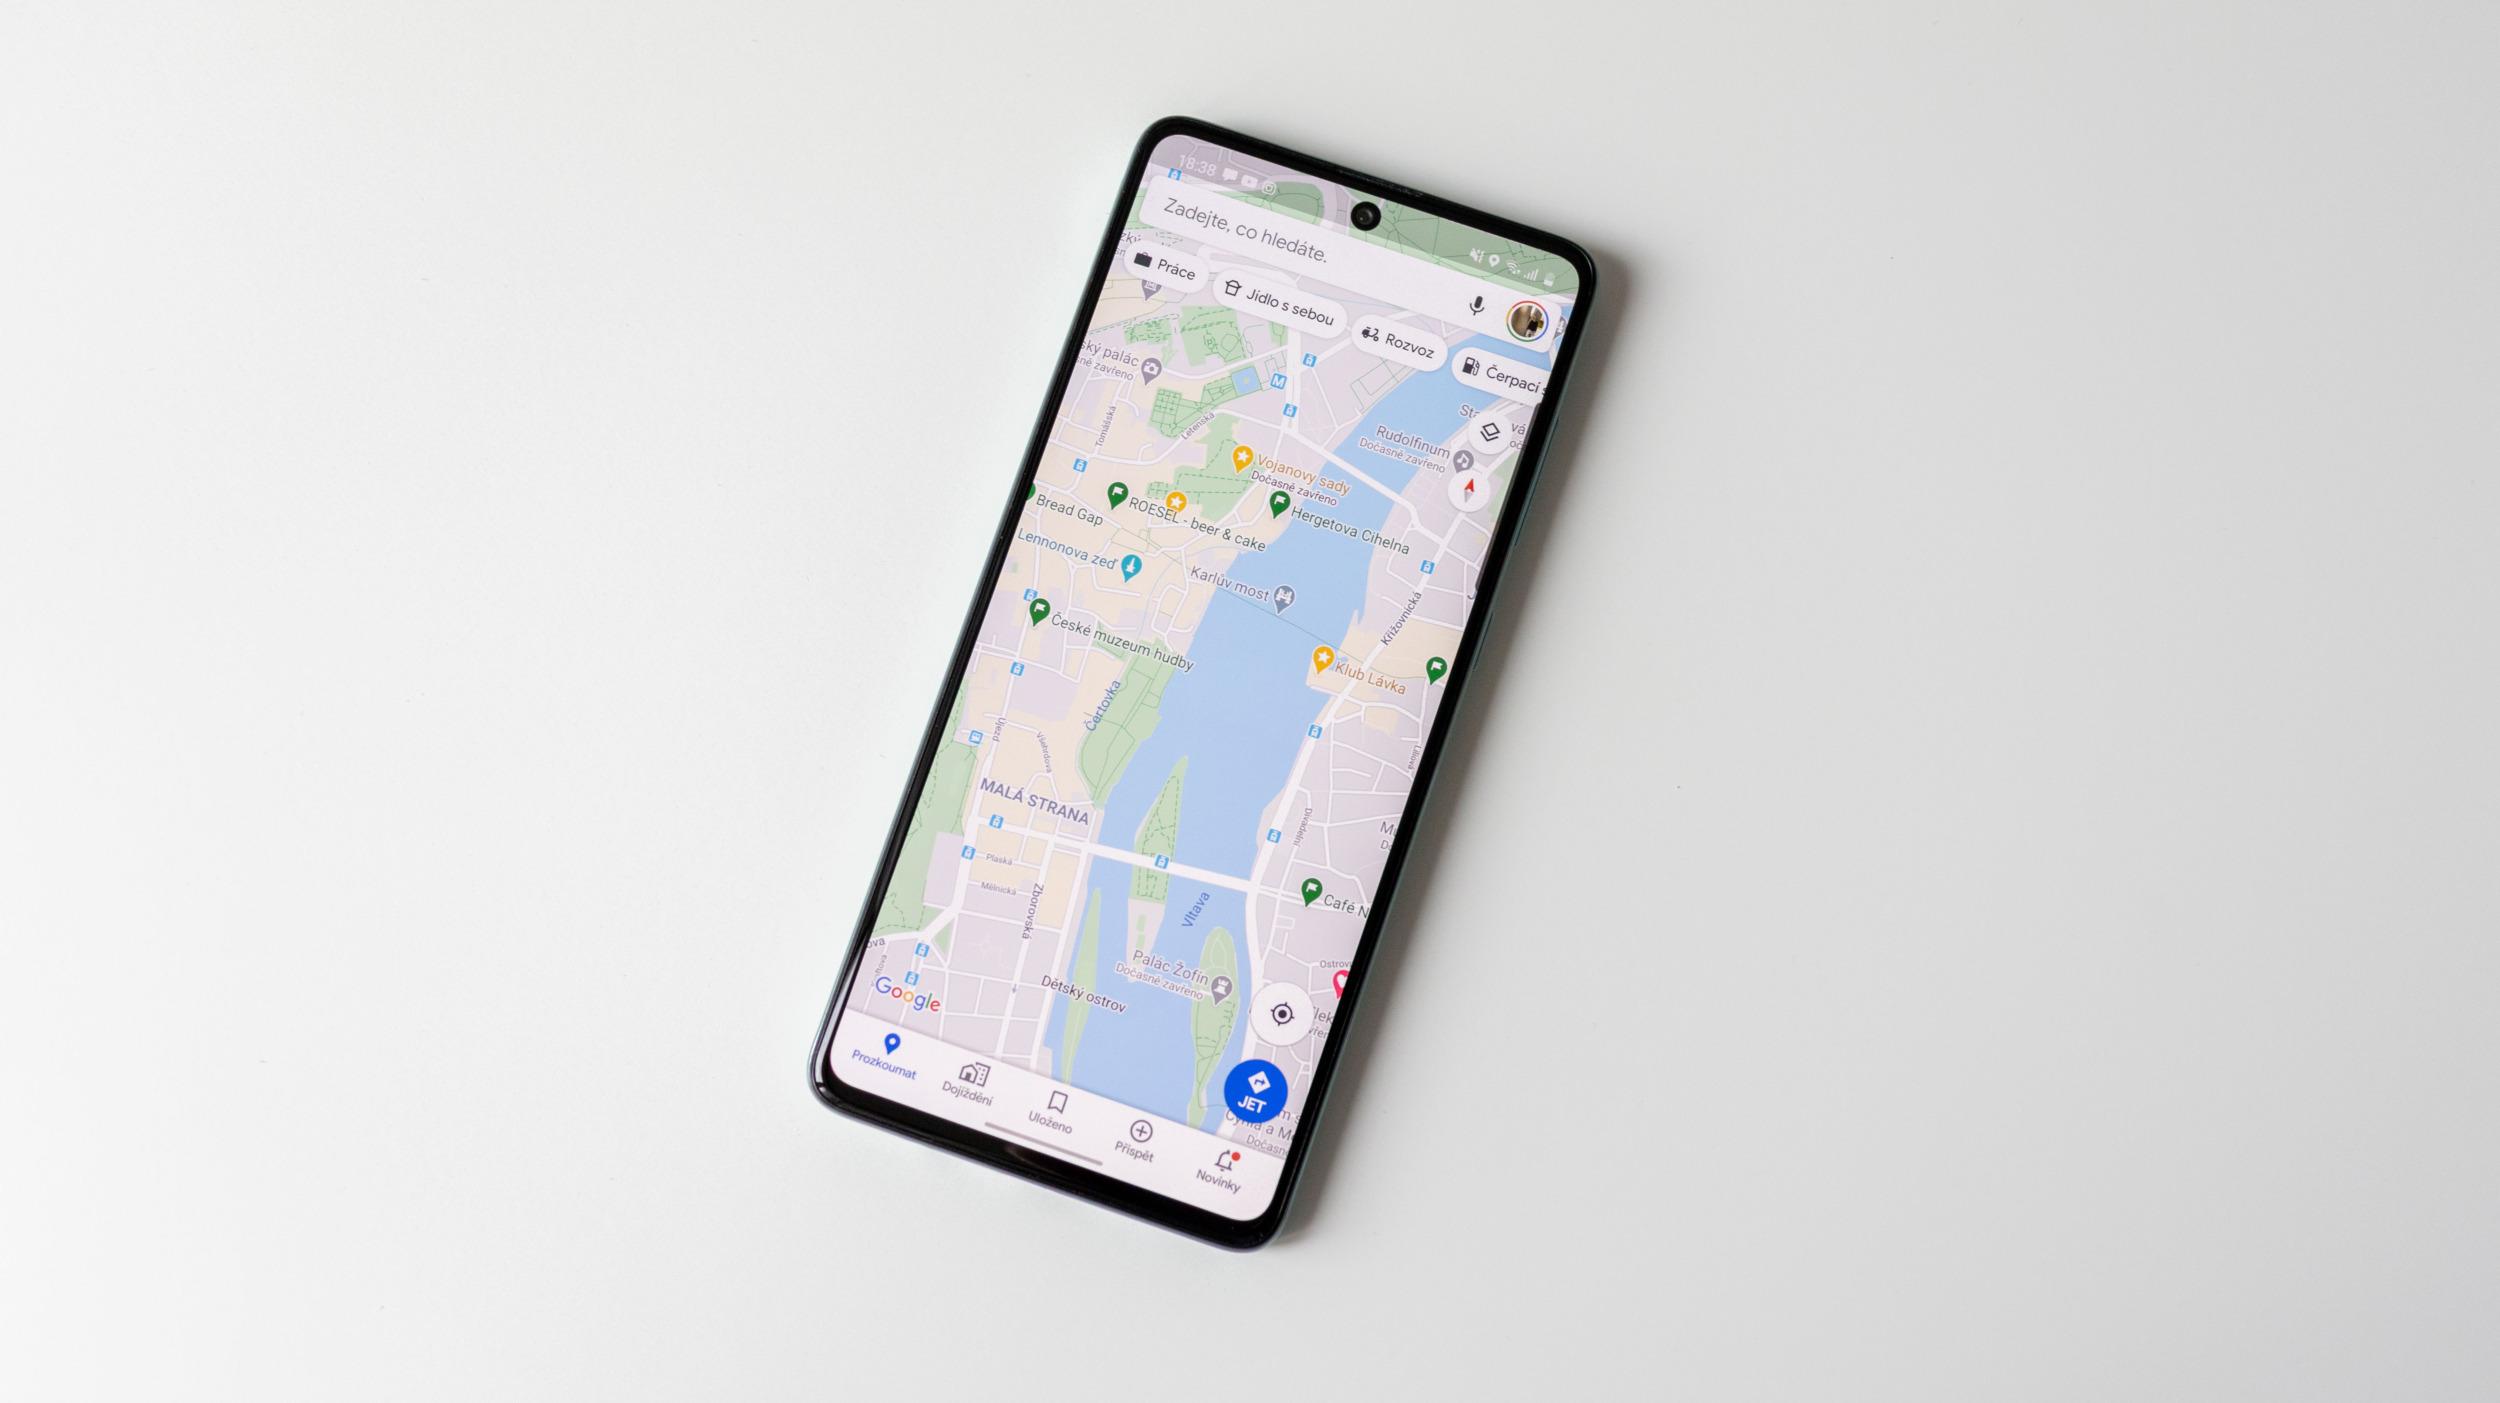 Google rozšíří vylepšené Live View i do Prahy